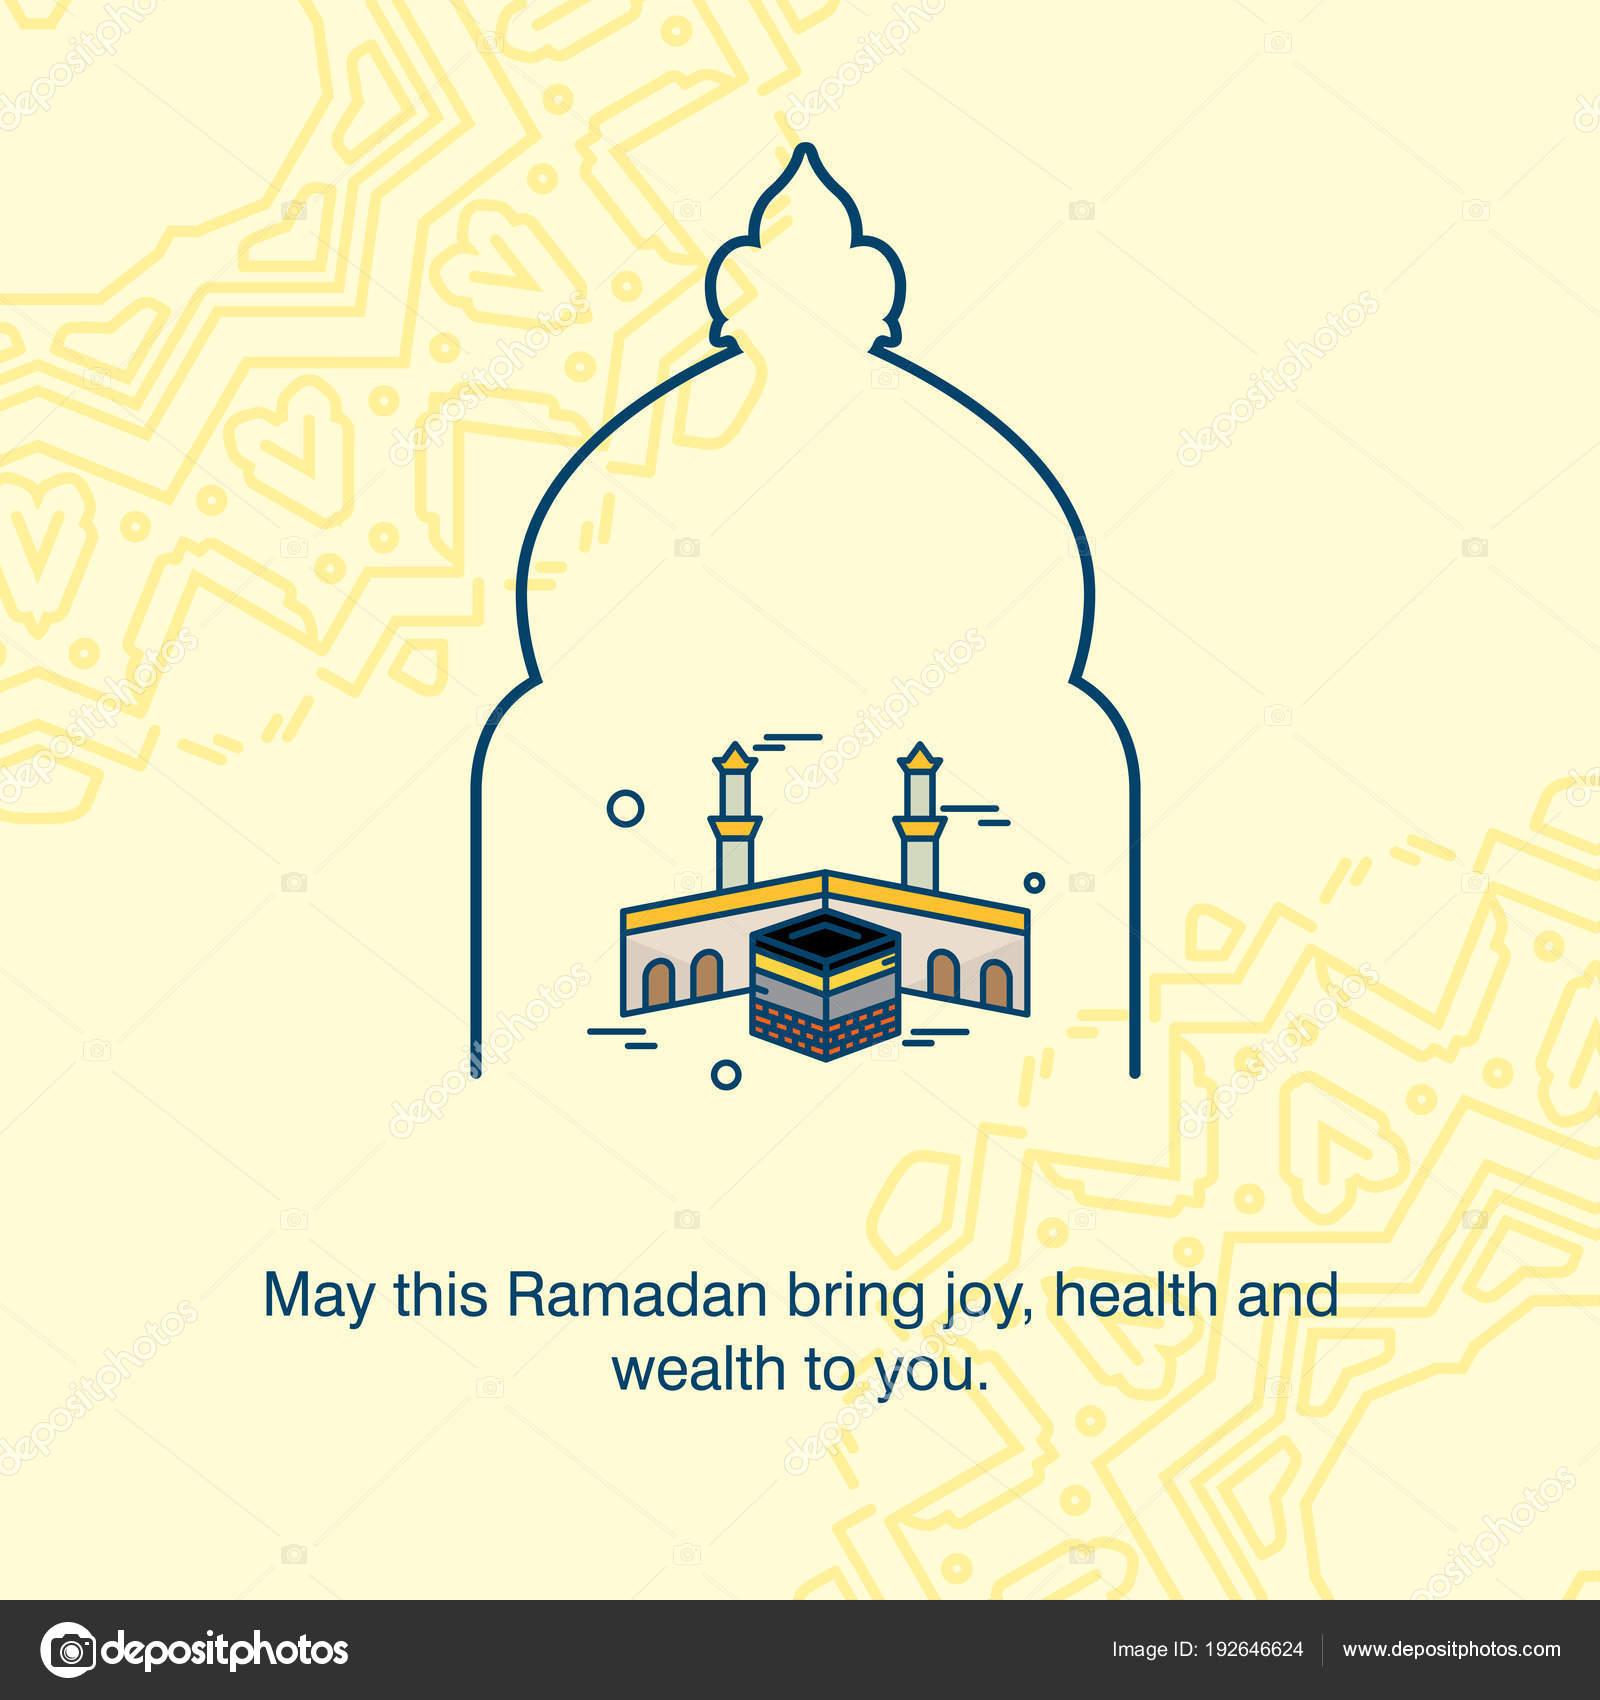 Colorful ramadan holiday greeting card design stock vector colorful ramadan holiday greeting card design stock vector m4hsunfo